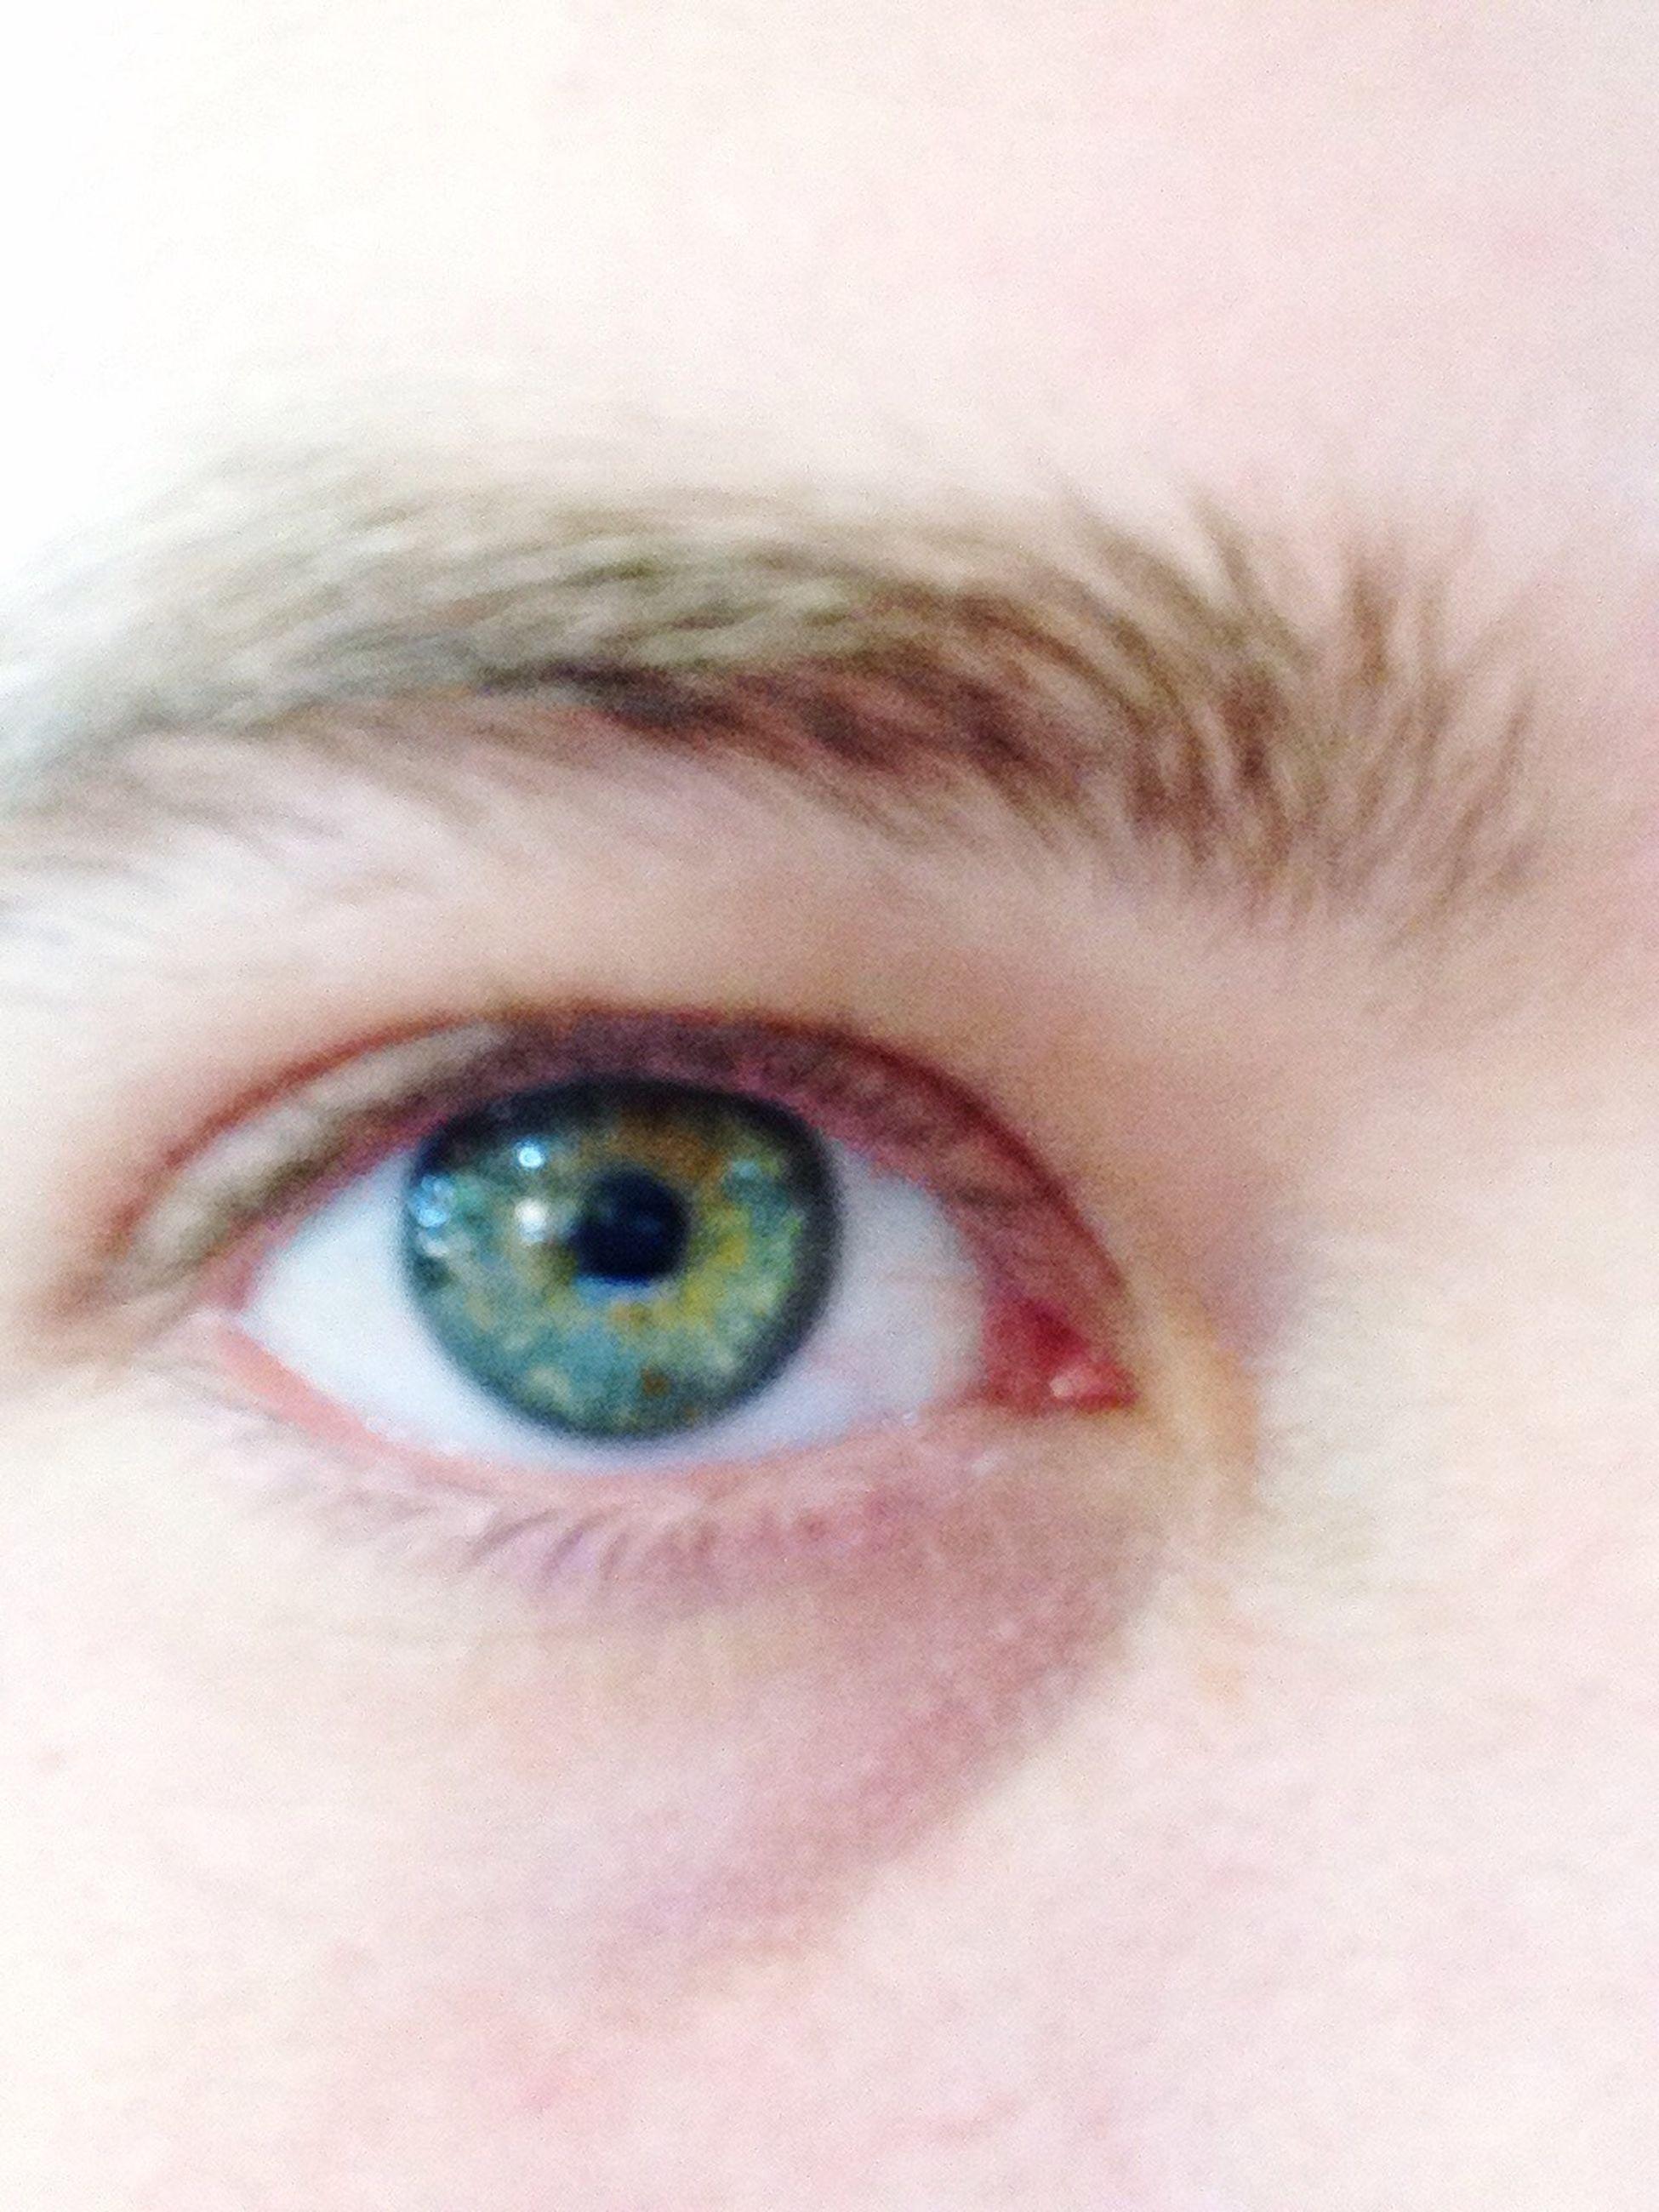 human eye, eyelash, close-up, looking at camera, portrait, eyesight, human face, sensory perception, human skin, part of, headshot, eyebrow, eyeball, extreme close-up, lifestyles, extreme close up, iris - eye